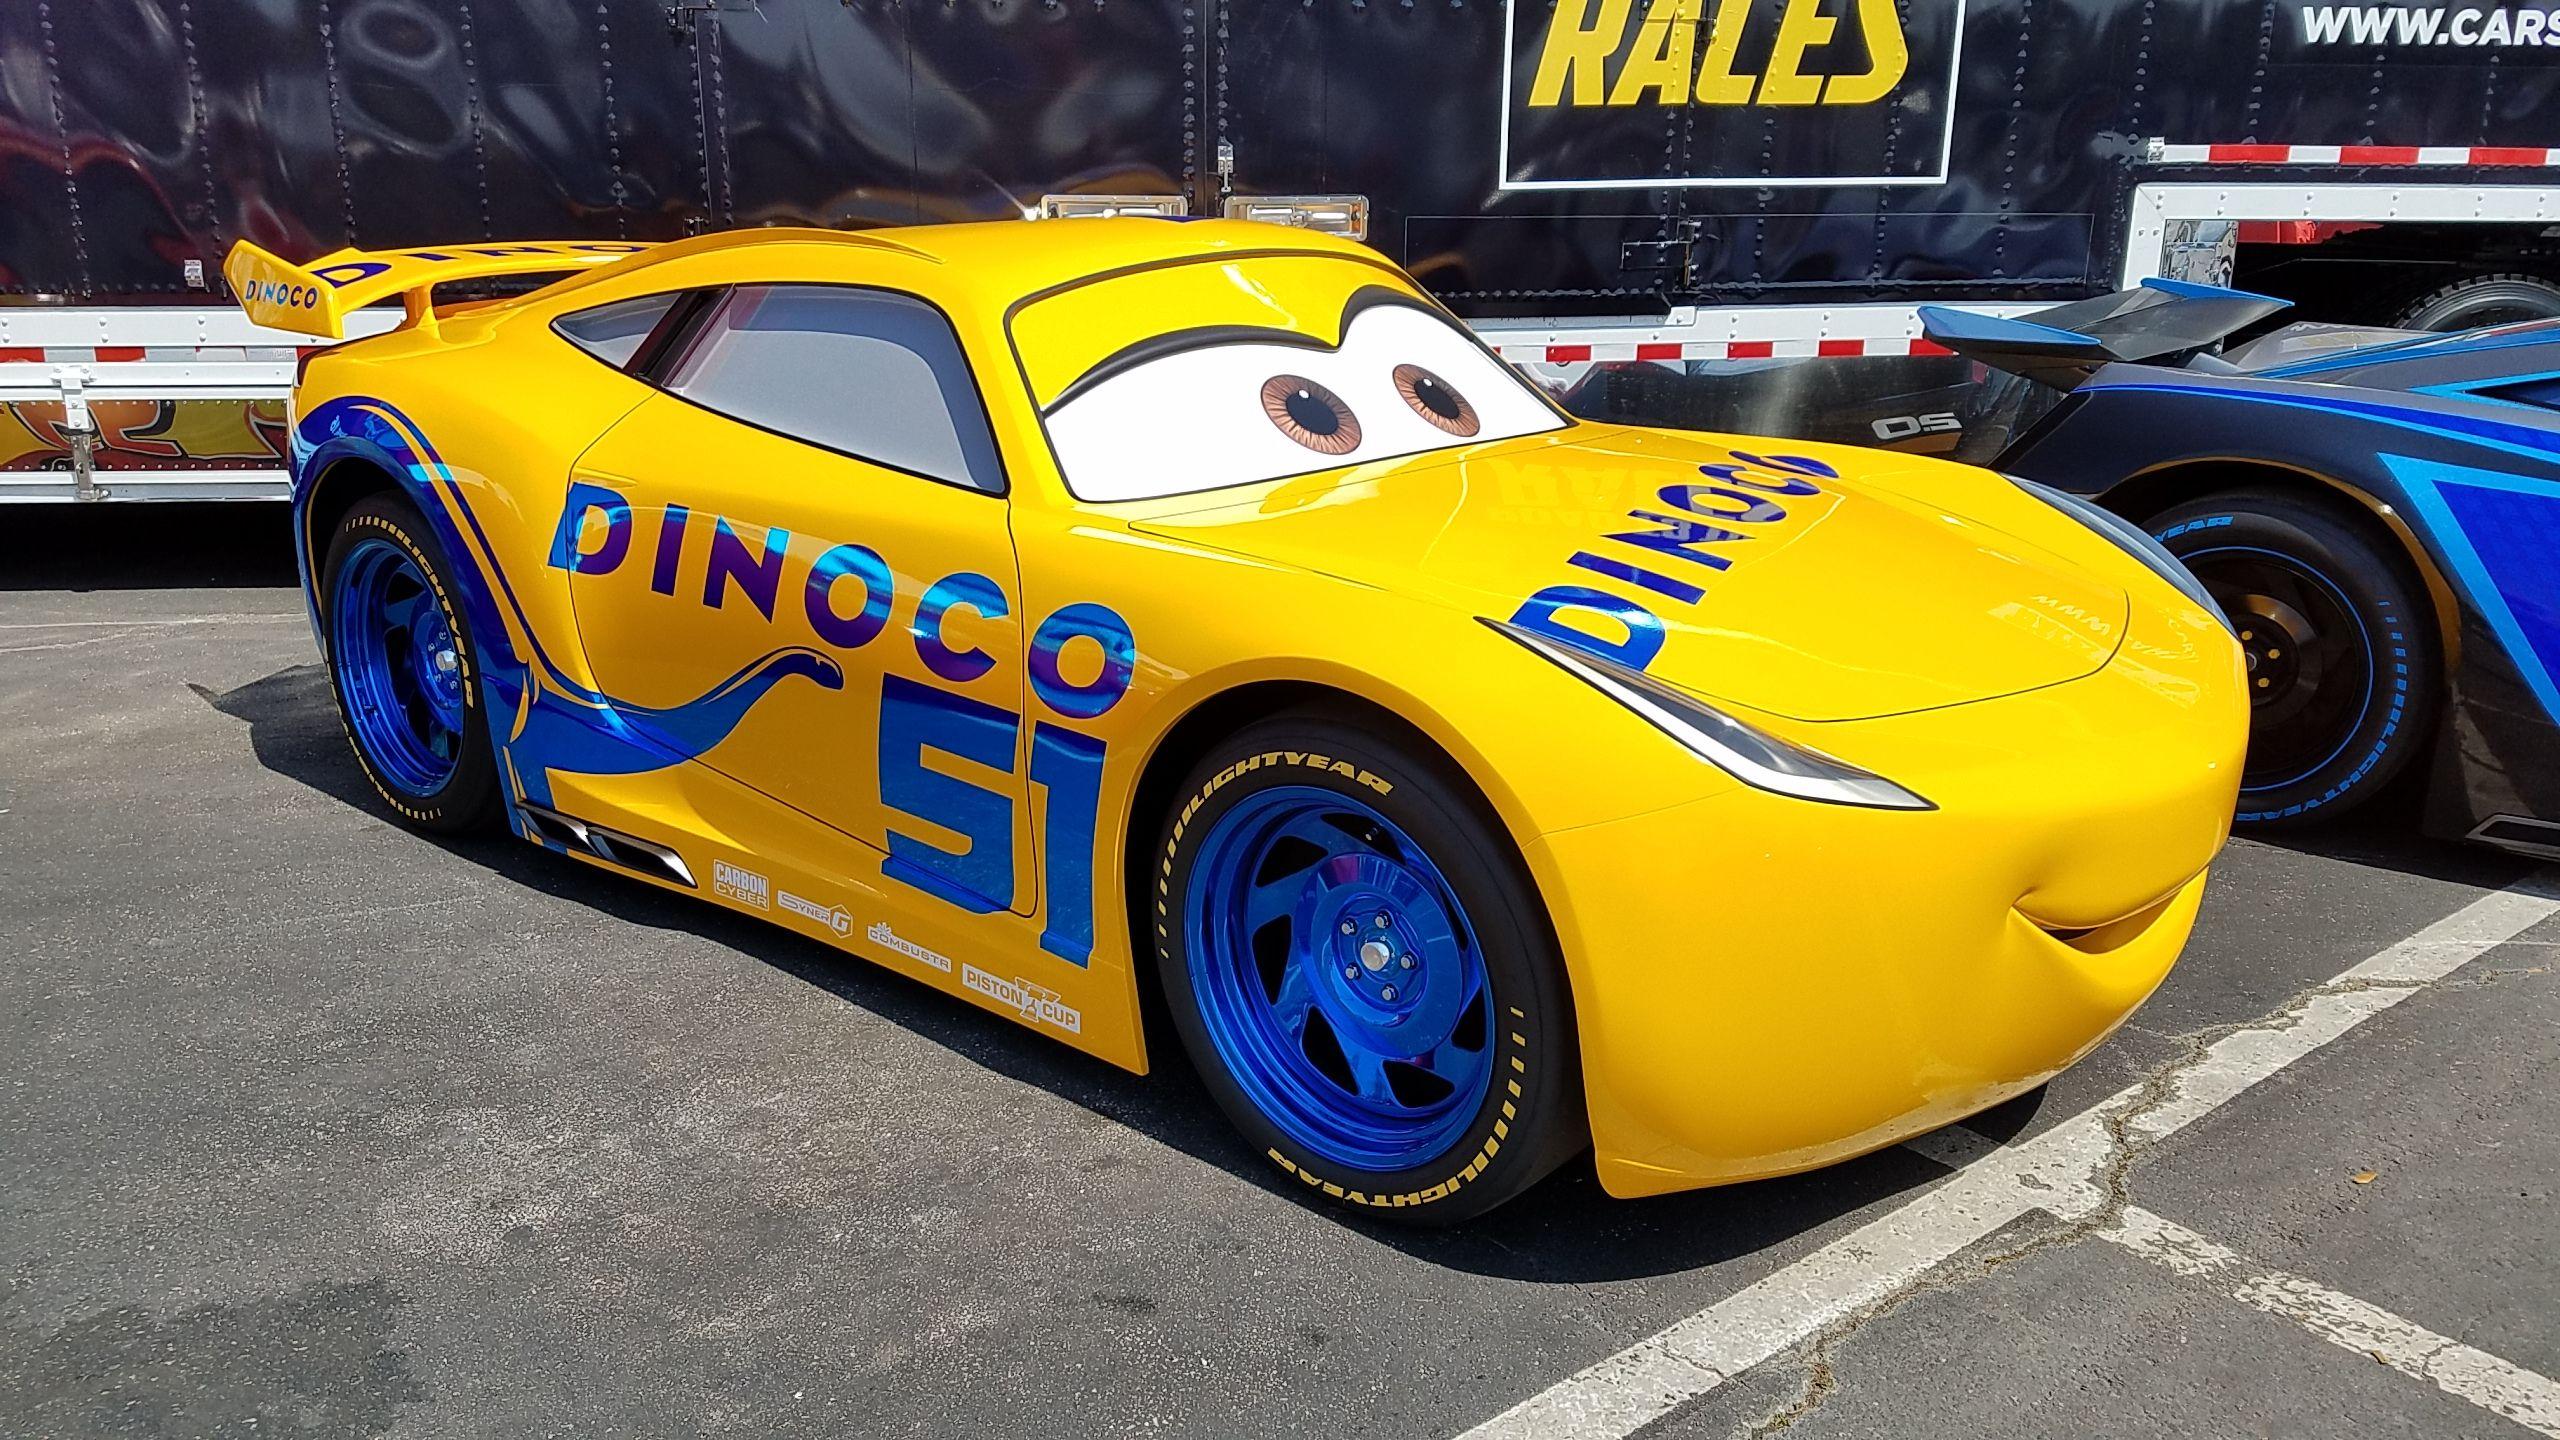 Cruz Ramirez Cars 3 Dinoco Disney Characters Modern Cruz